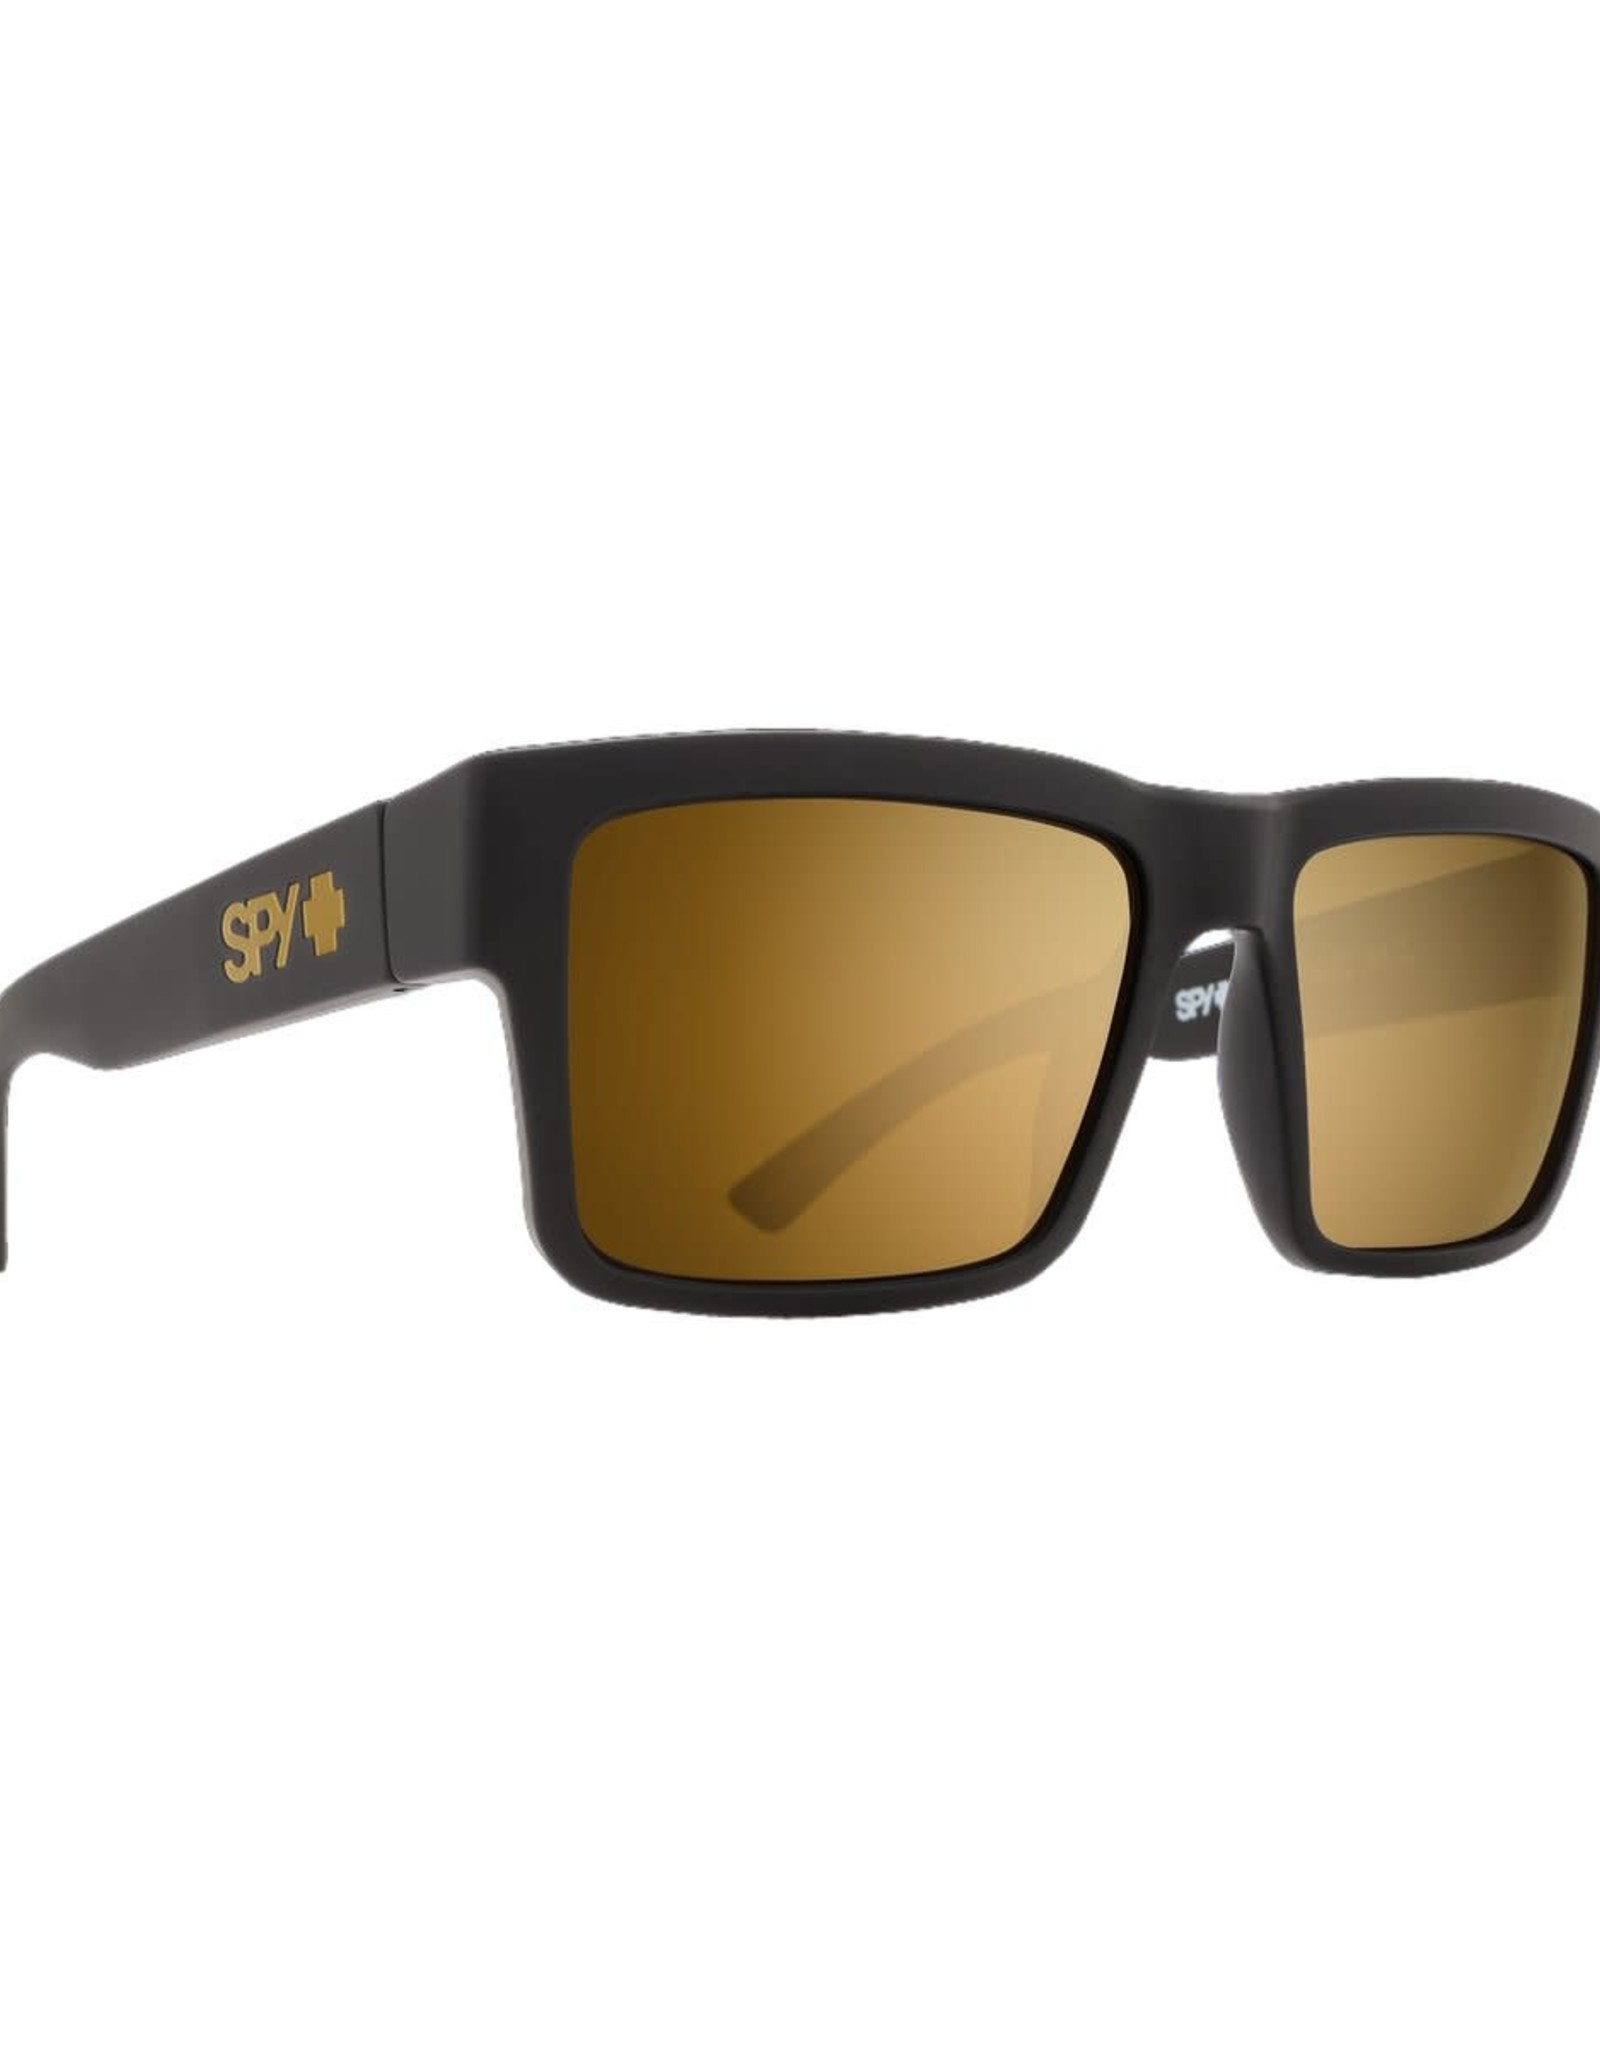 SPY SPY - MONTANA - Soft Matte BLK - bronze/gold spec.